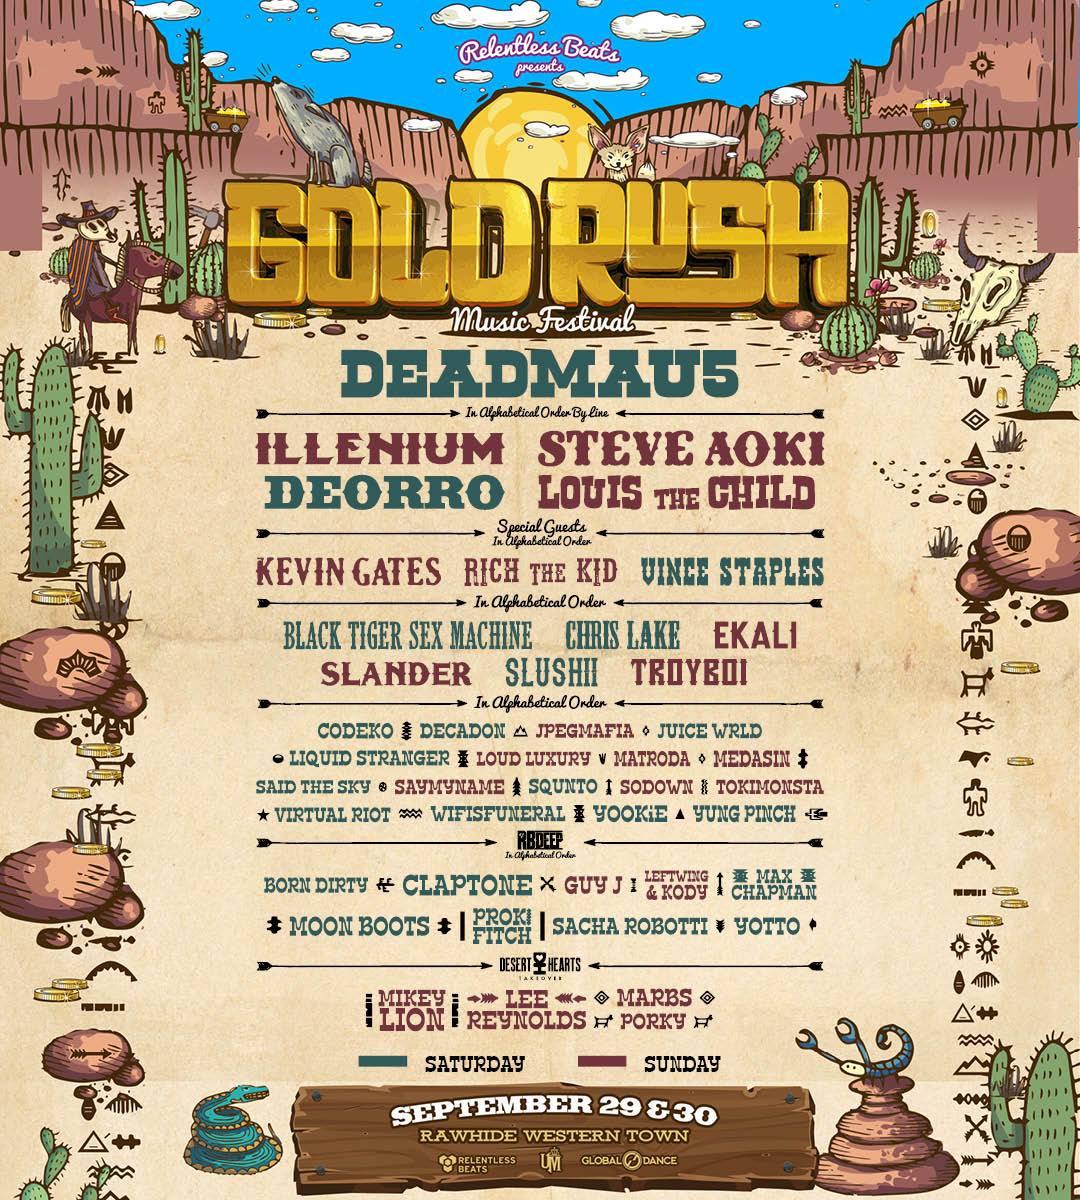 Gold Rush Music Festival Lineup